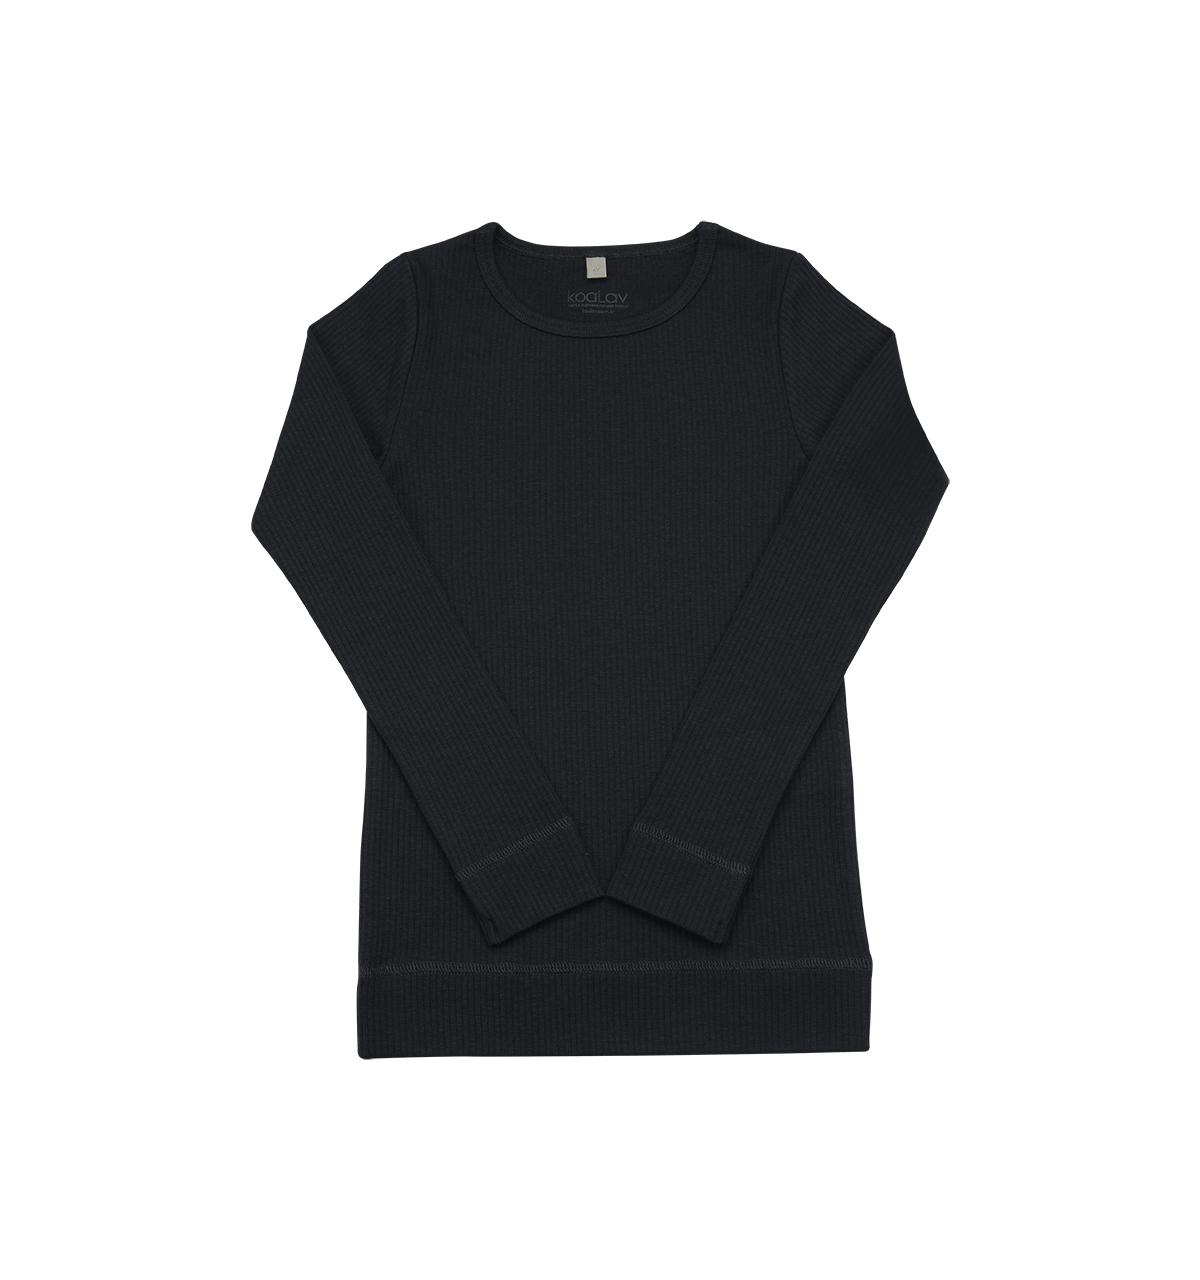 Koalav - Kendinden Fitilli Uzun Kollu Antrasit T-Shirt